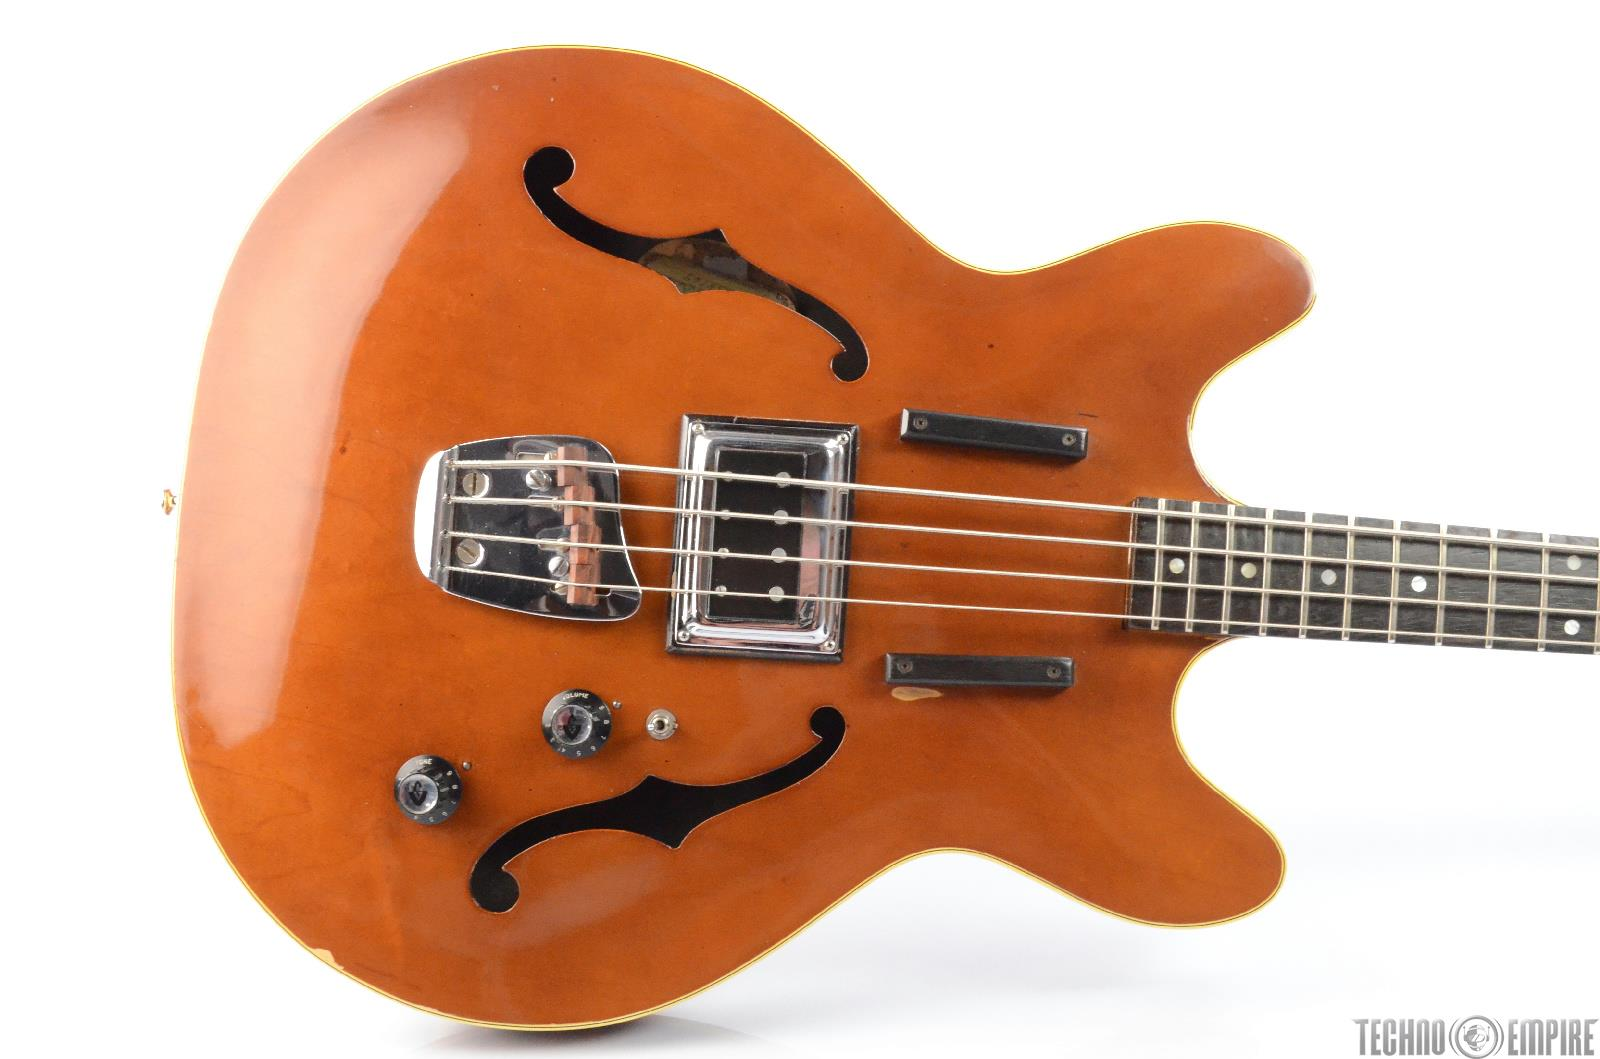 1964 Vintage Guild Starfire Semi-Hollow Electric Bass Guitar w/ Case #25967